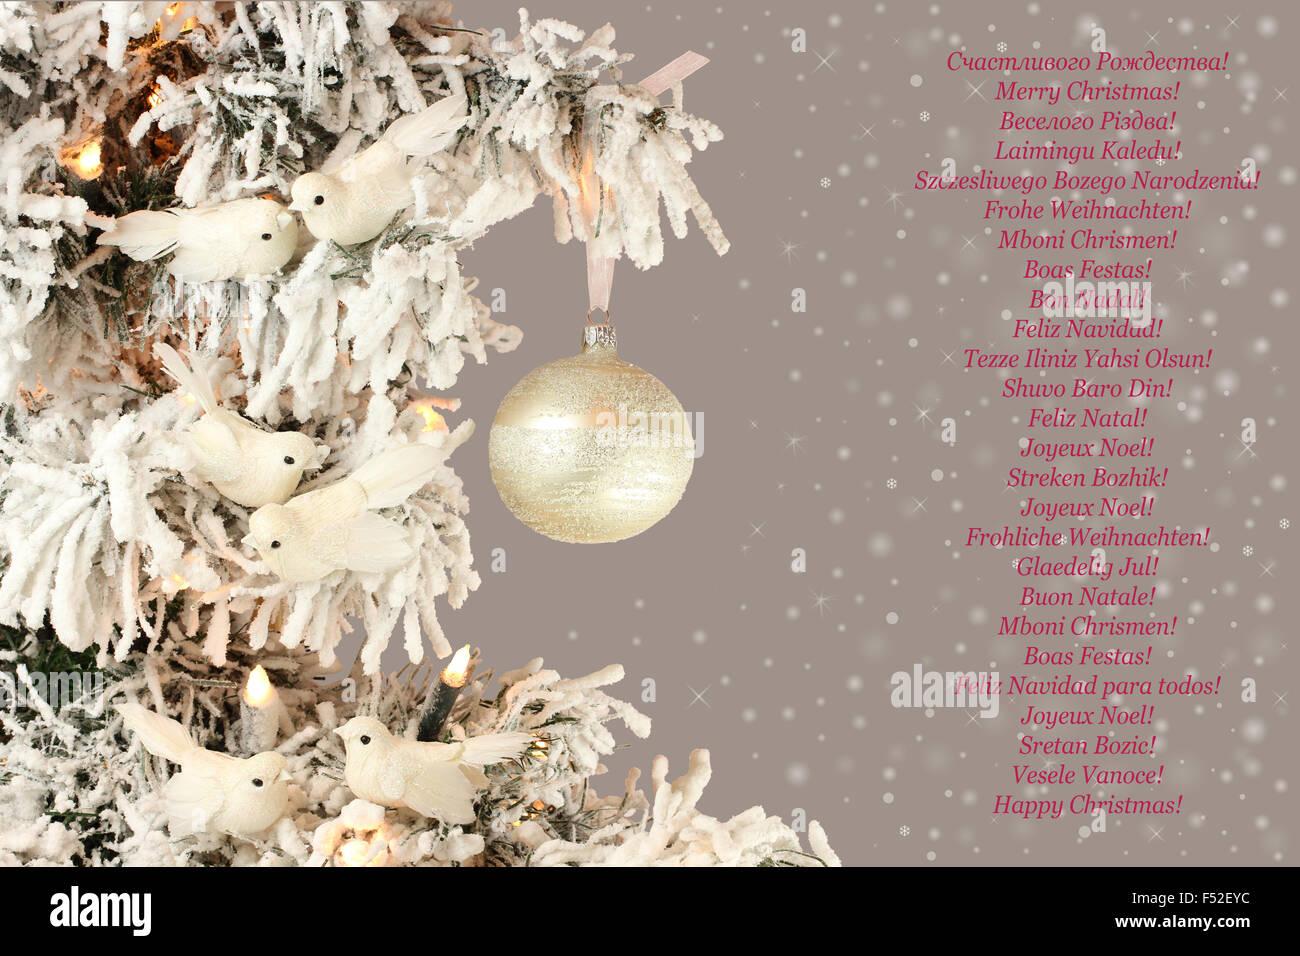 Joyeux Noel Twilight.Decoration On Christmas Tree White Birds And Silver Ball